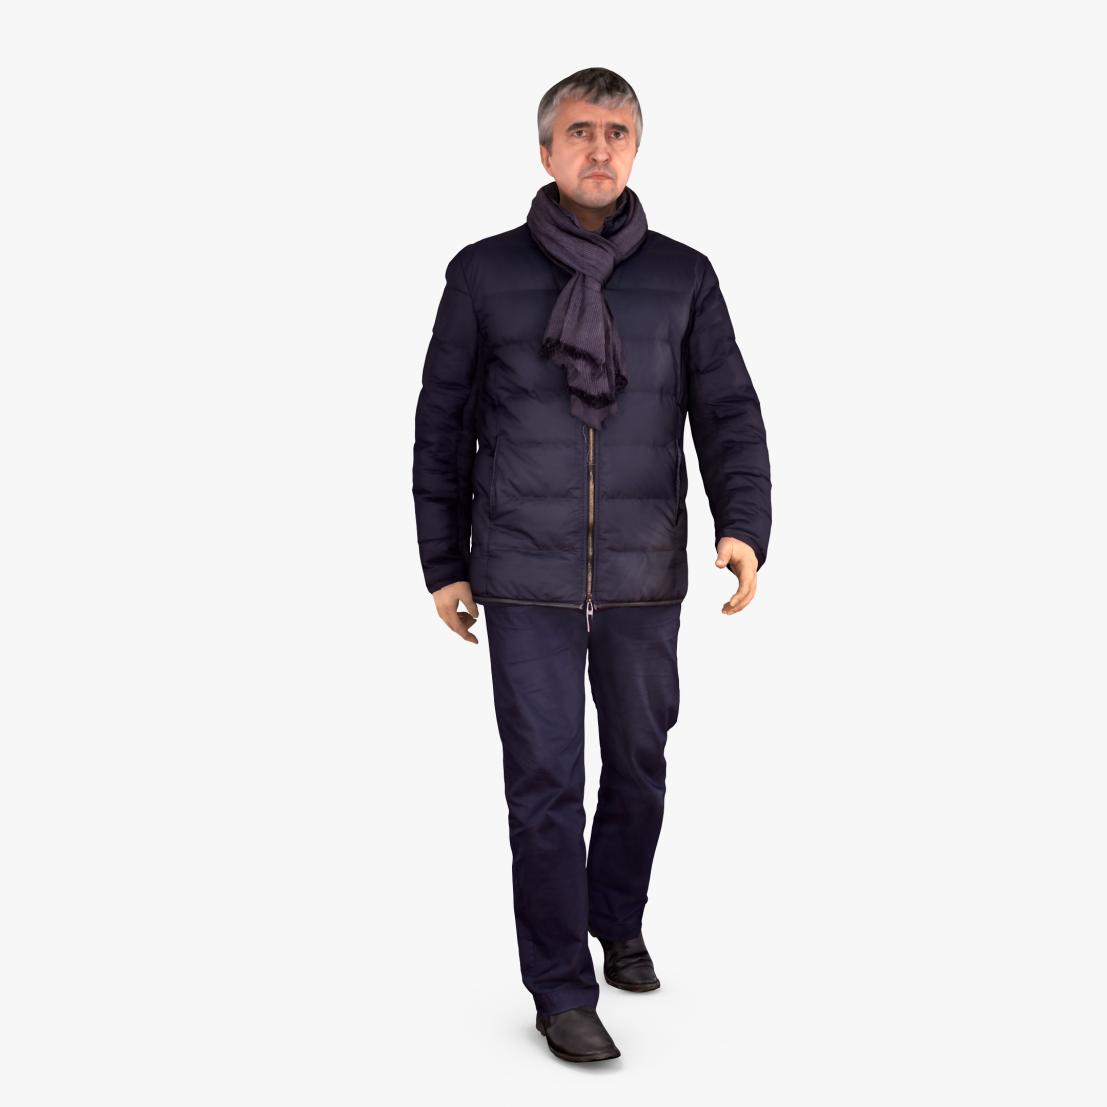 Casual Man Winter 3D Model | 3DTree Scanning Studio